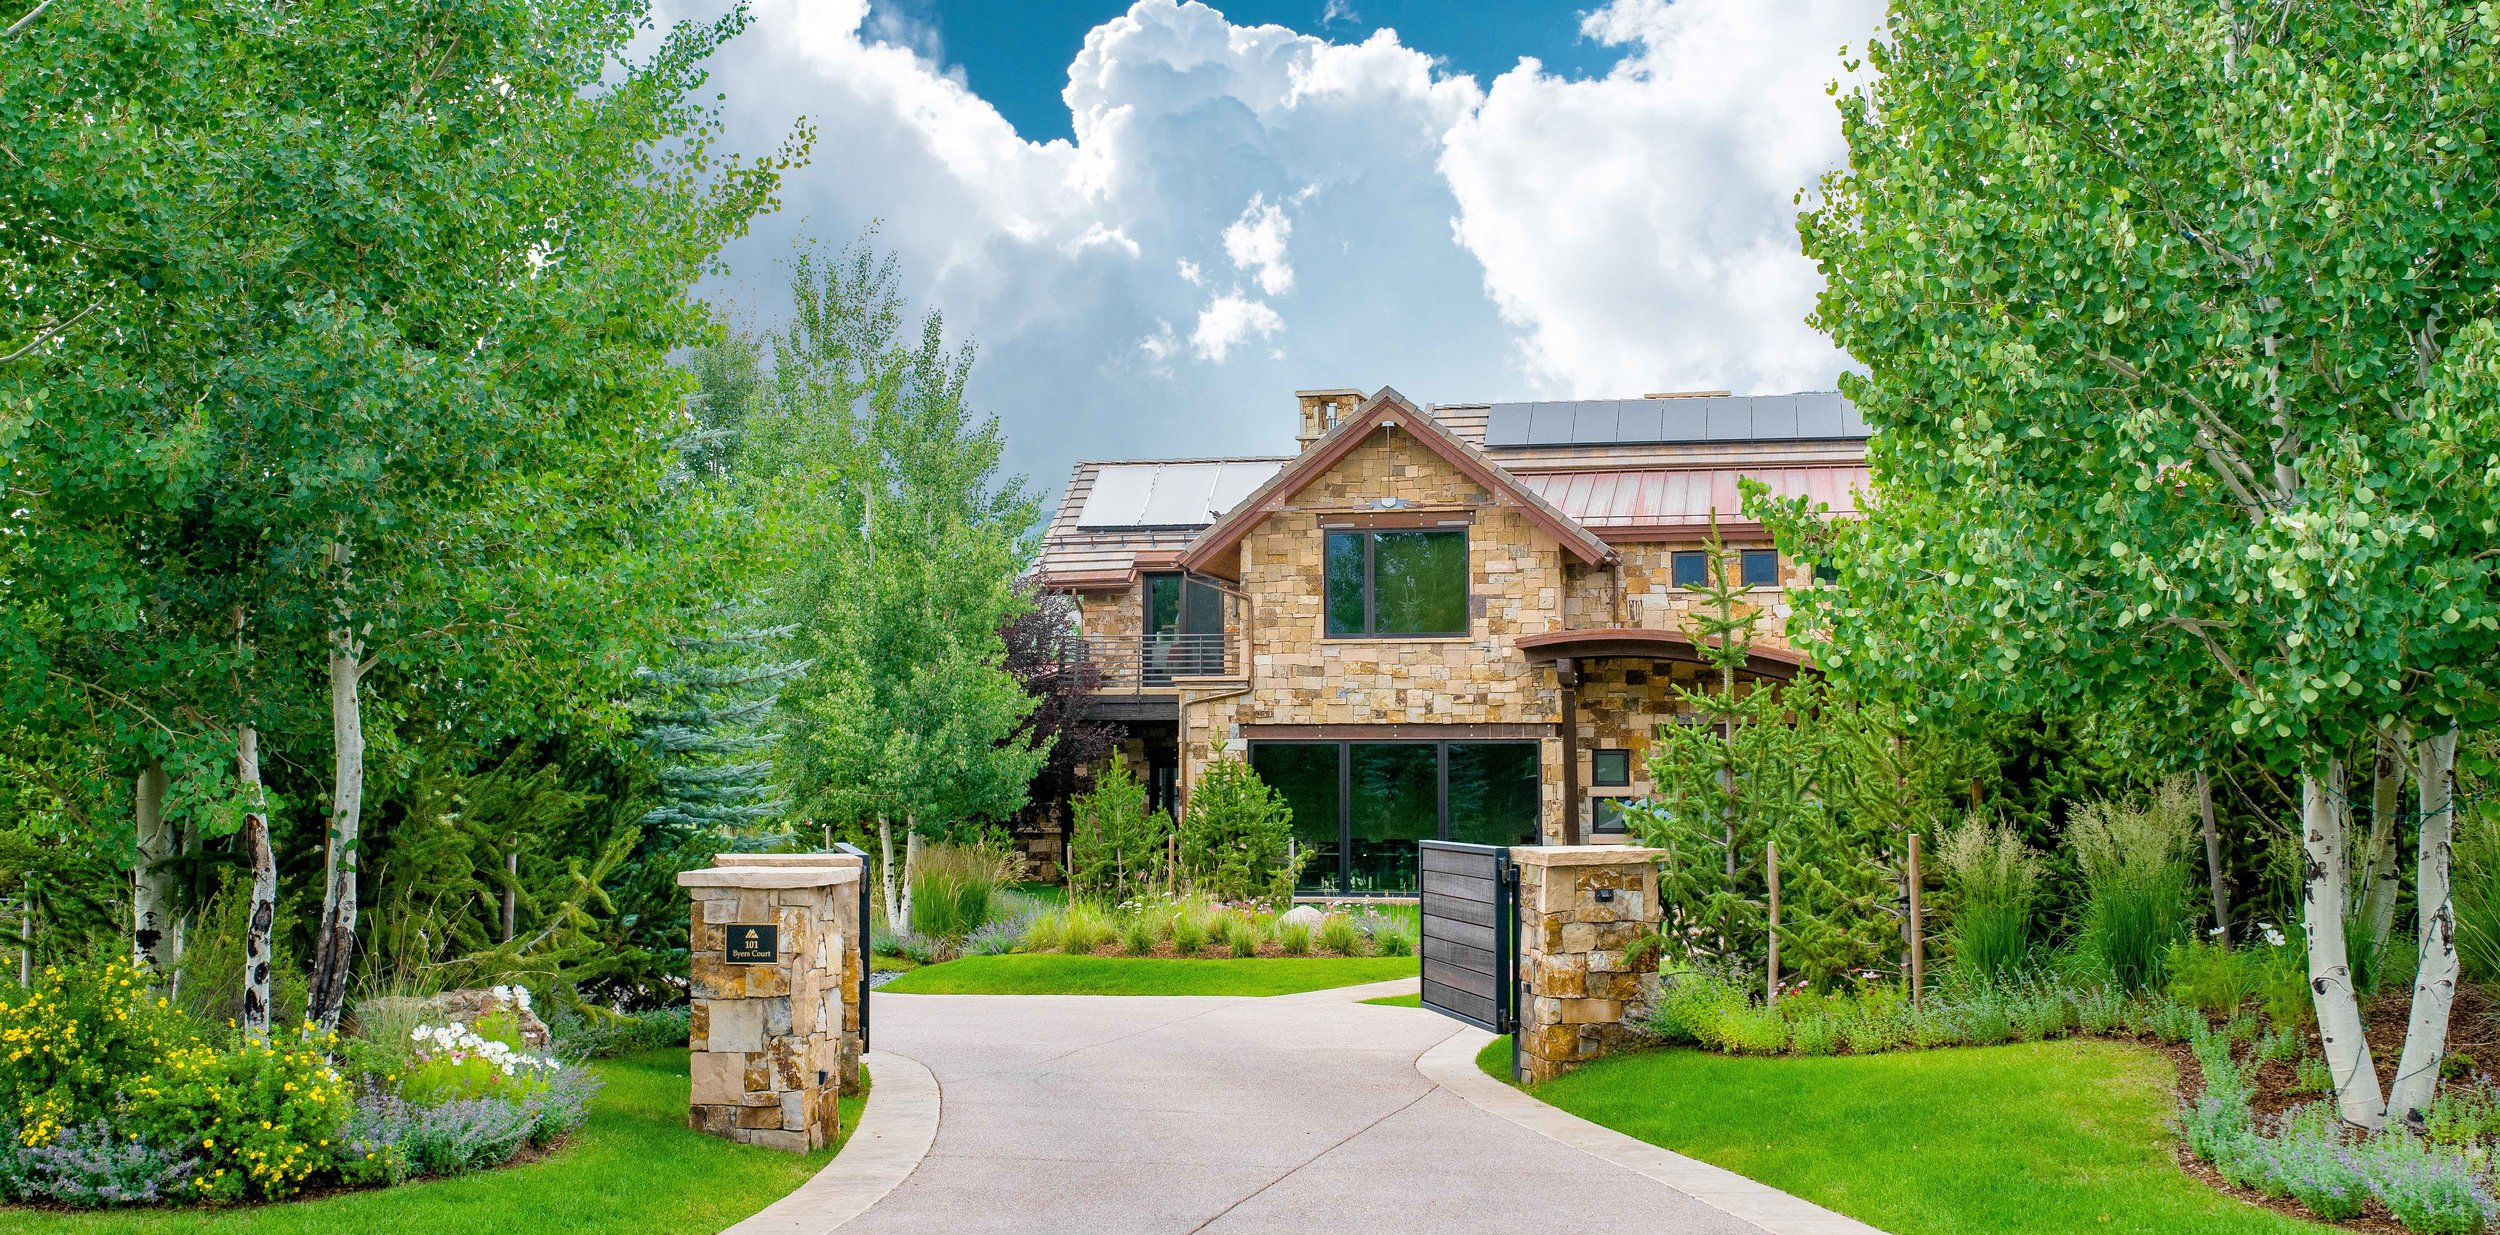 Aspen Luxury Residential Landcape